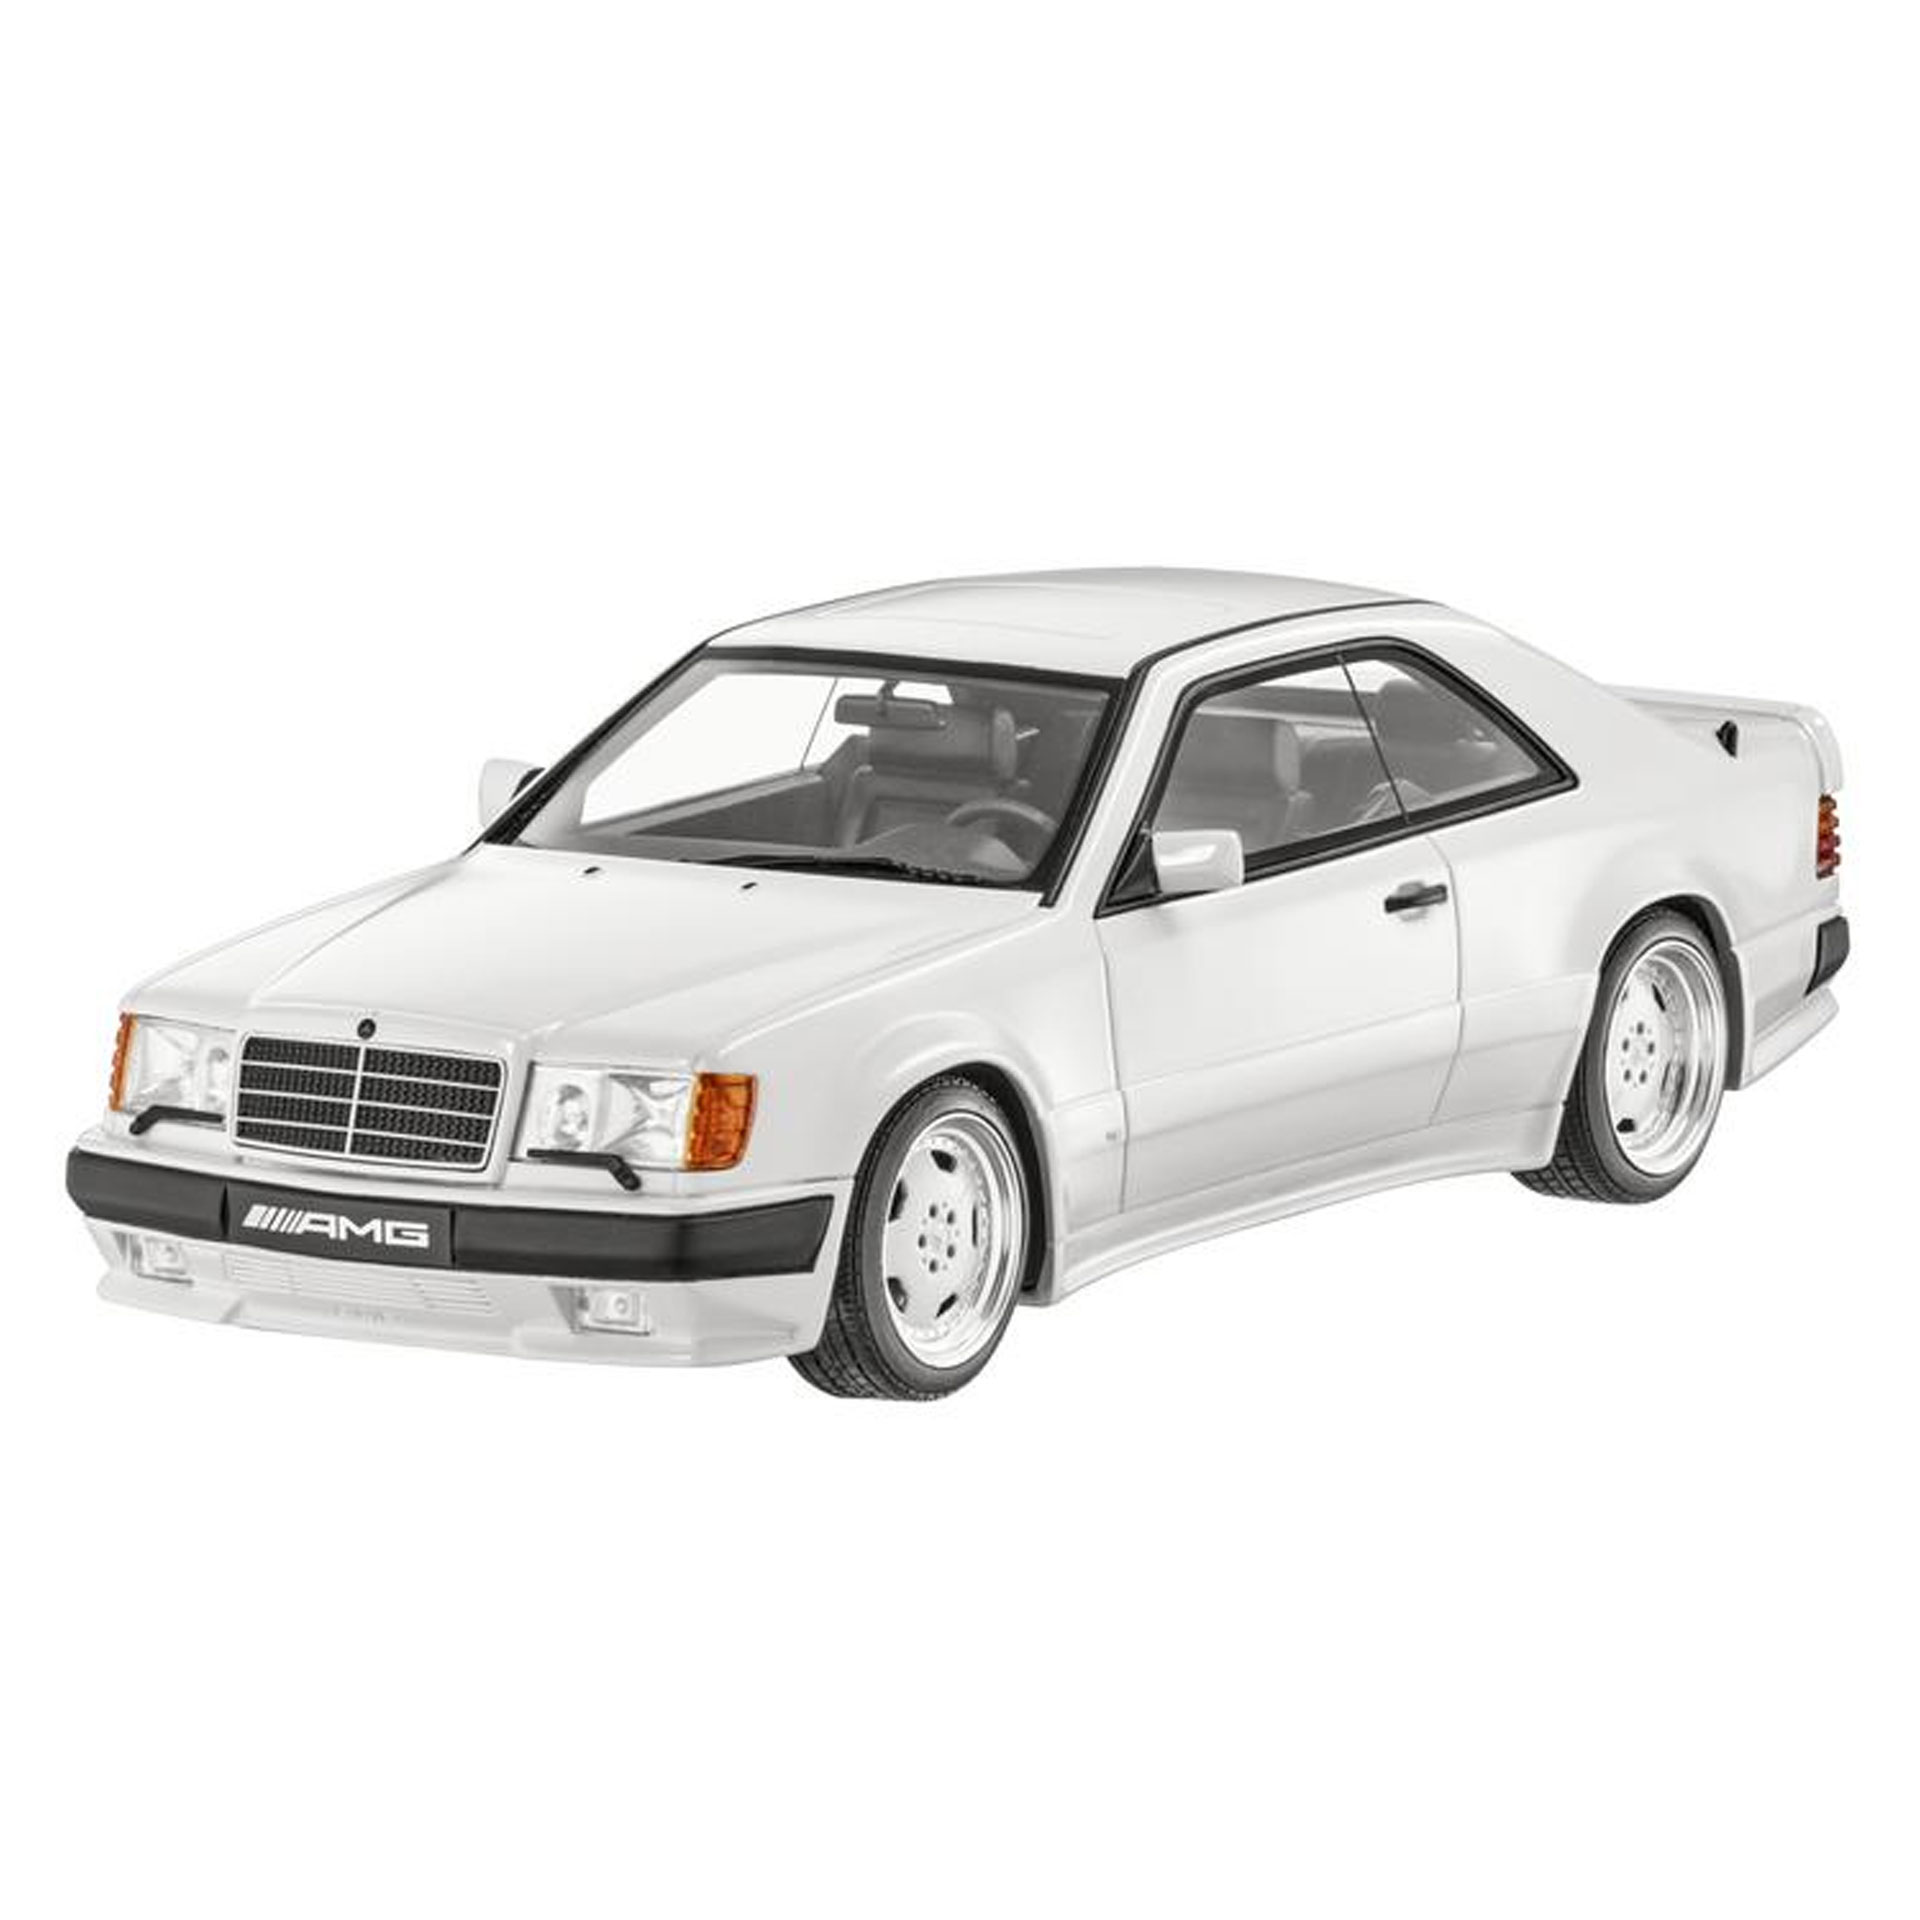 Mercedes-Benz Modellauto 300 CE AMG 6.0L C 124 (1988) 1:18 limitiert